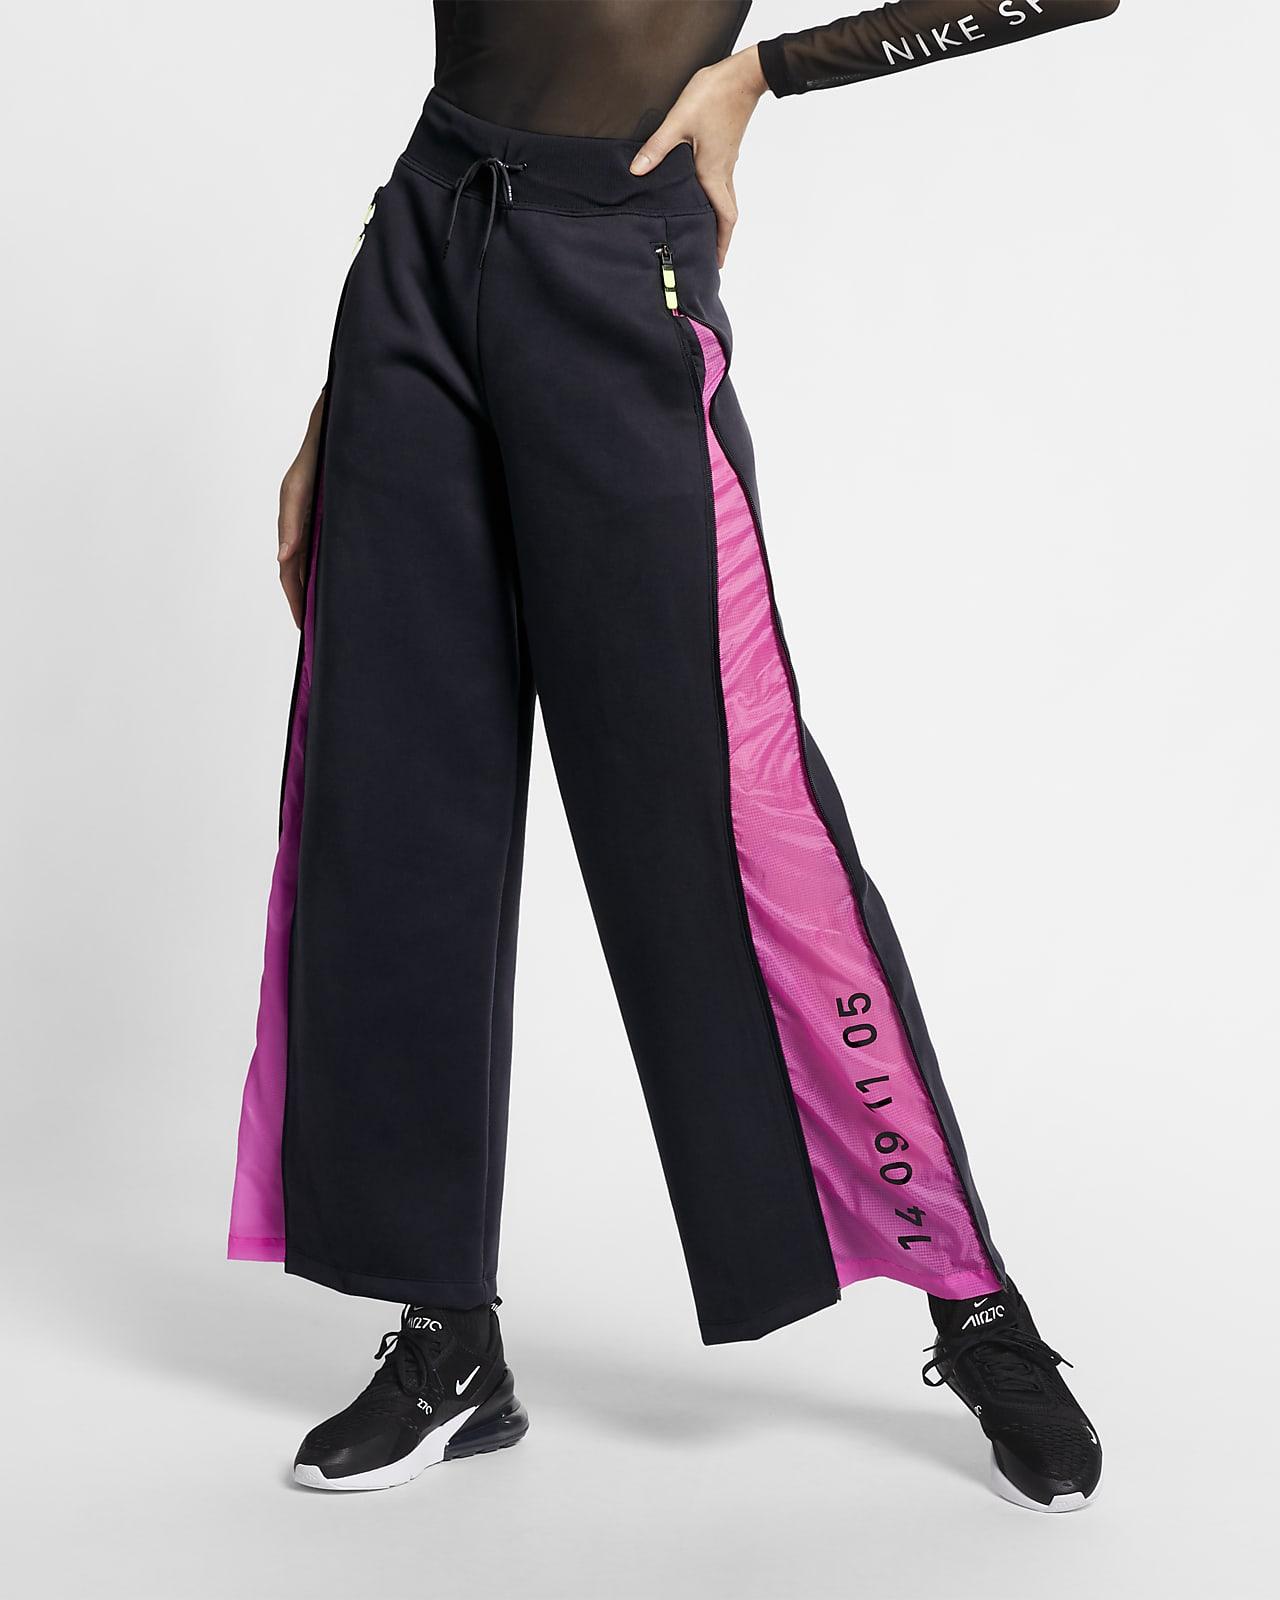 Ver a través de Referéndum Bigote  Nike Sportswear Tech Pack Women's Fleece Trousers. Nike LU